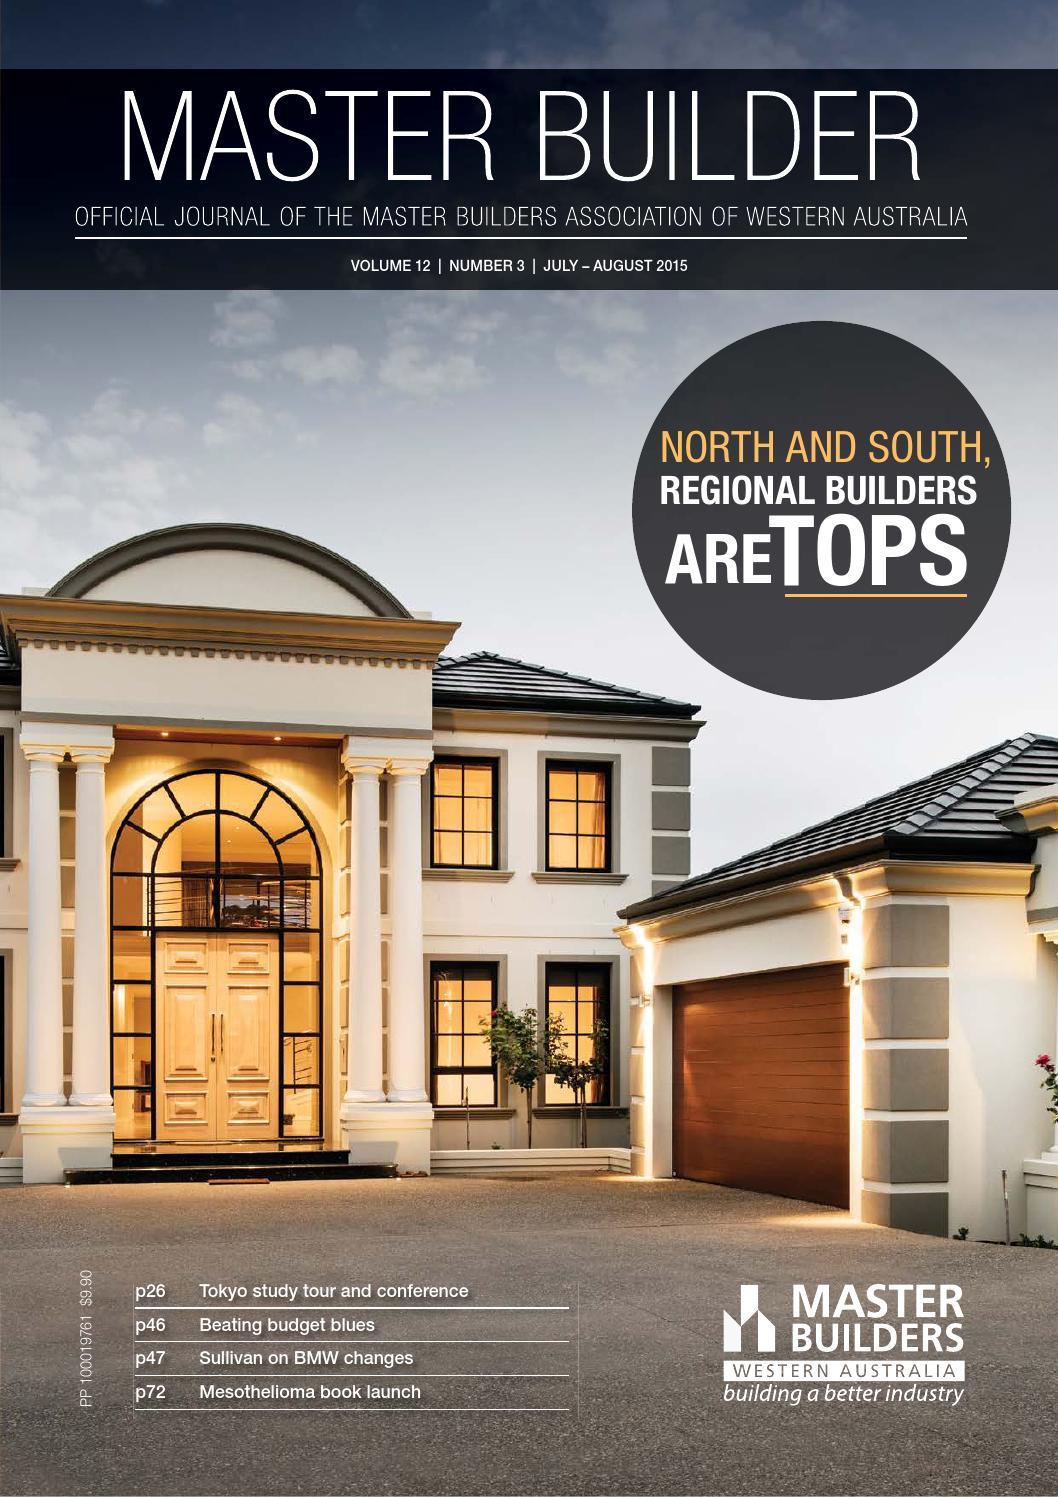 2015 Master Builders Western Australia Magazine July